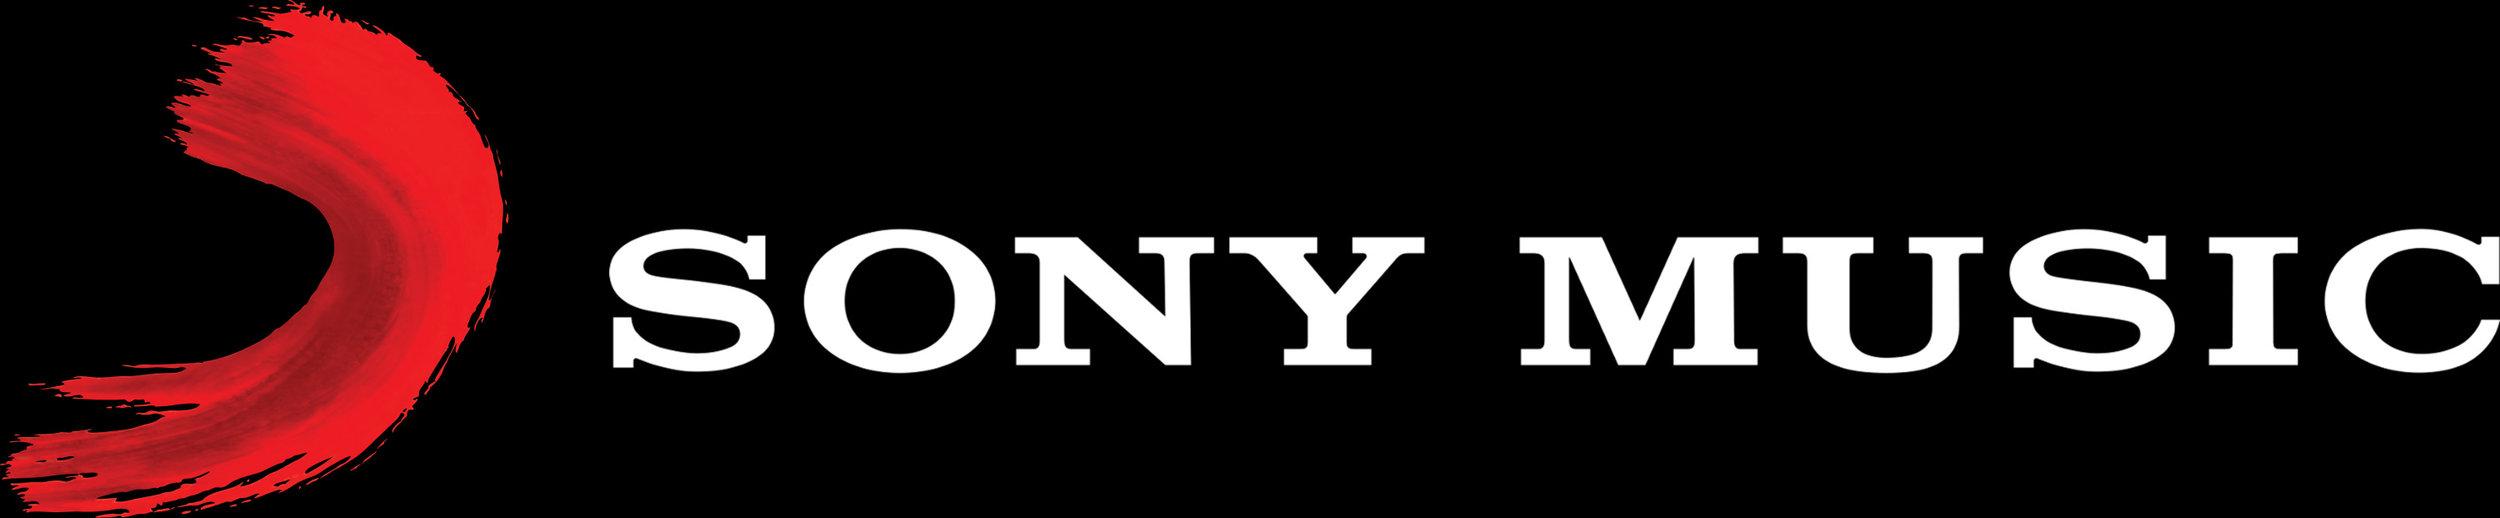 Sony_Music_Entertainment_Logo_(2009)_II.jpg